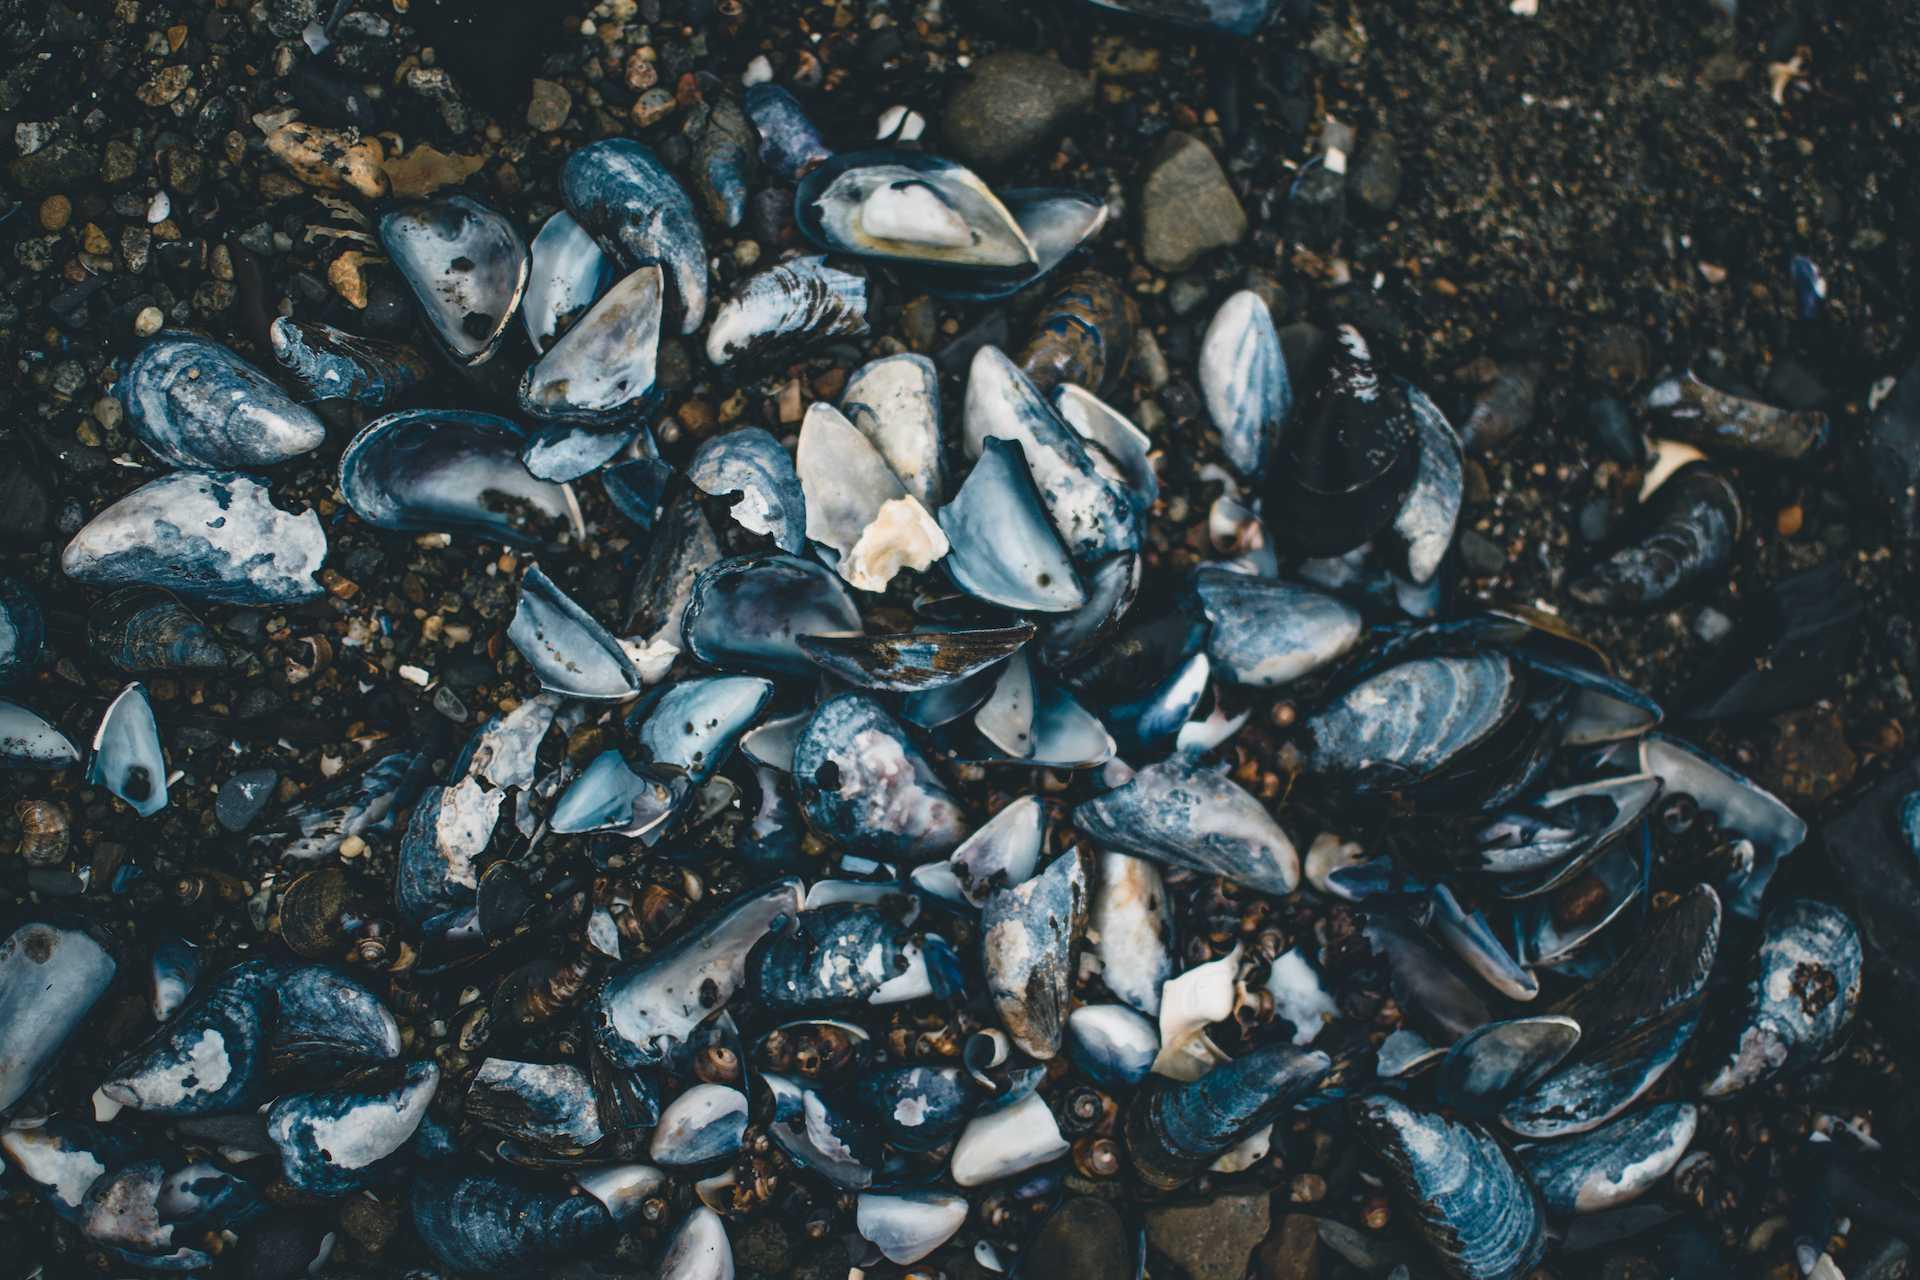 norweskie owoce morza